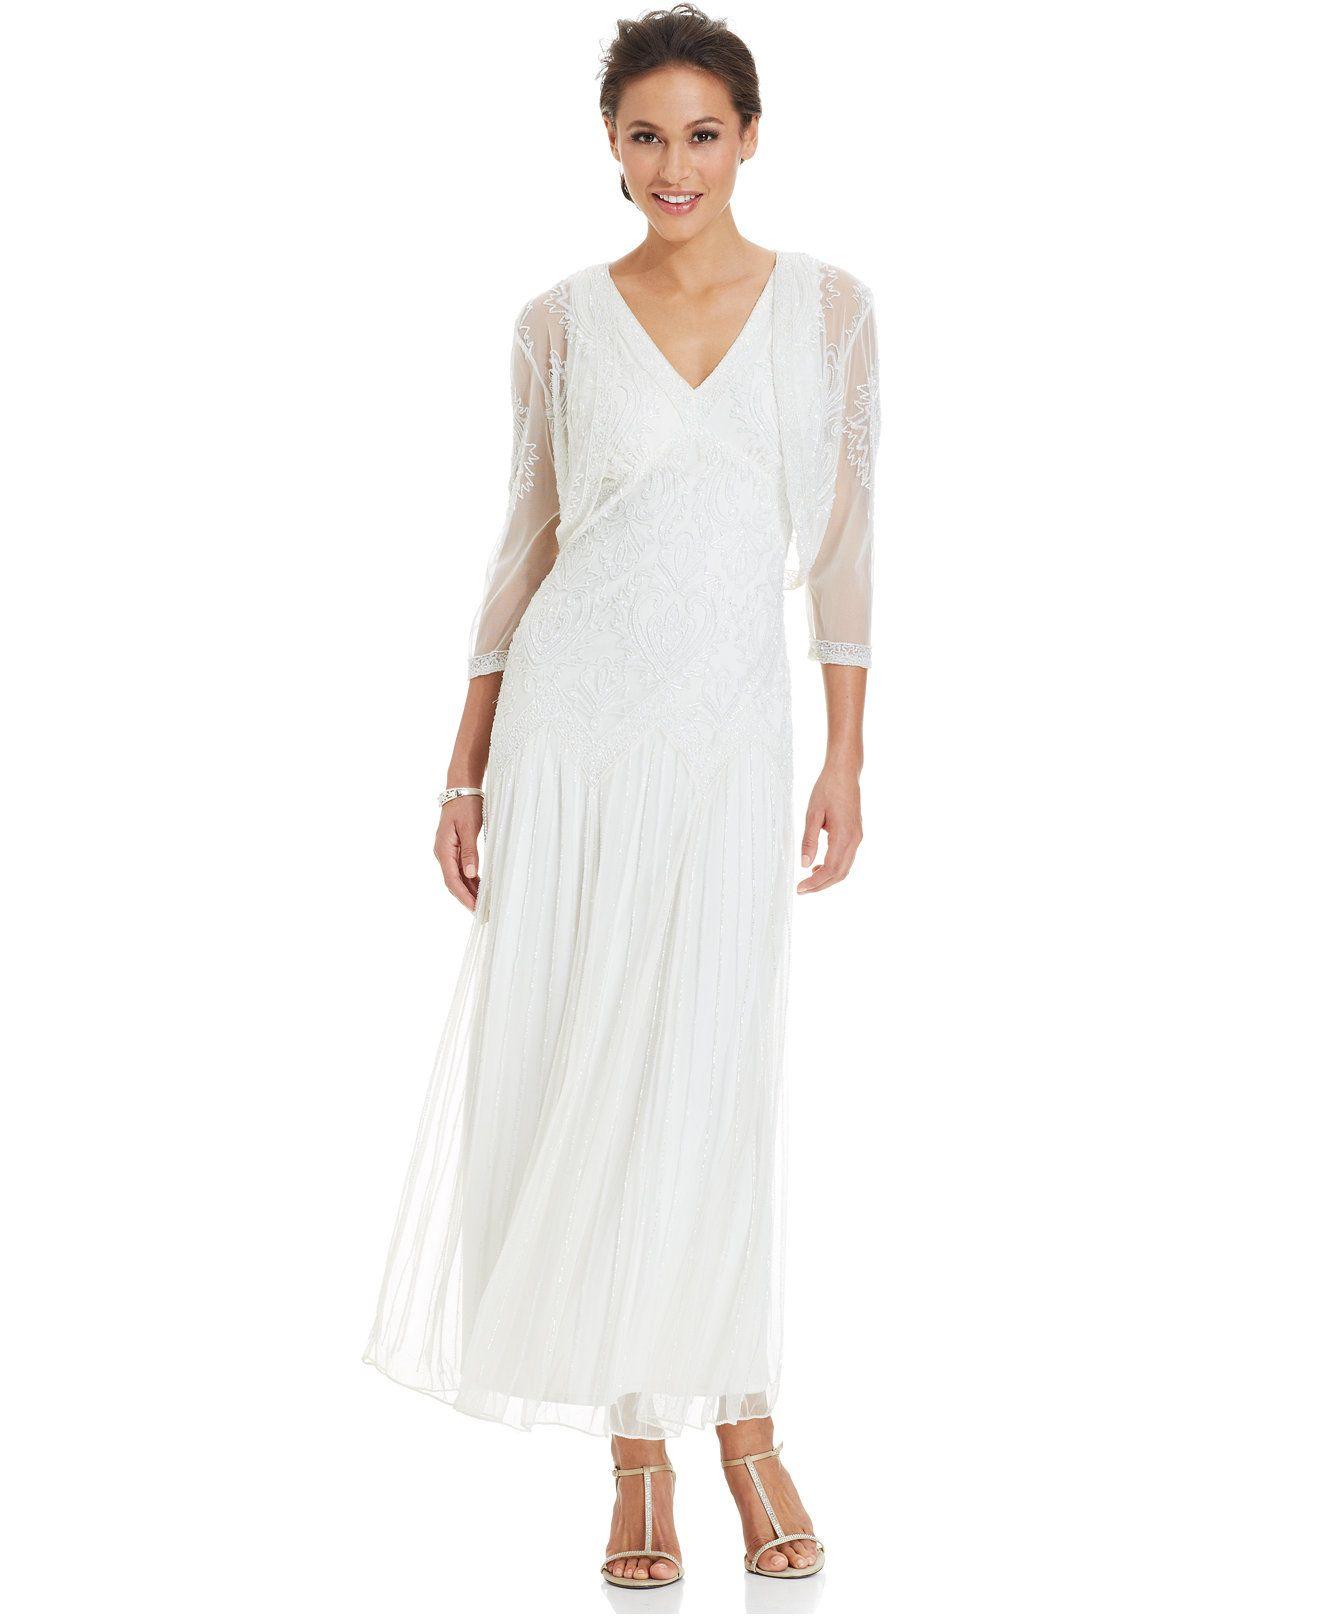 Pisarro Nights Sleeveless Beaded Gown and Jacket - Wedding Day ...